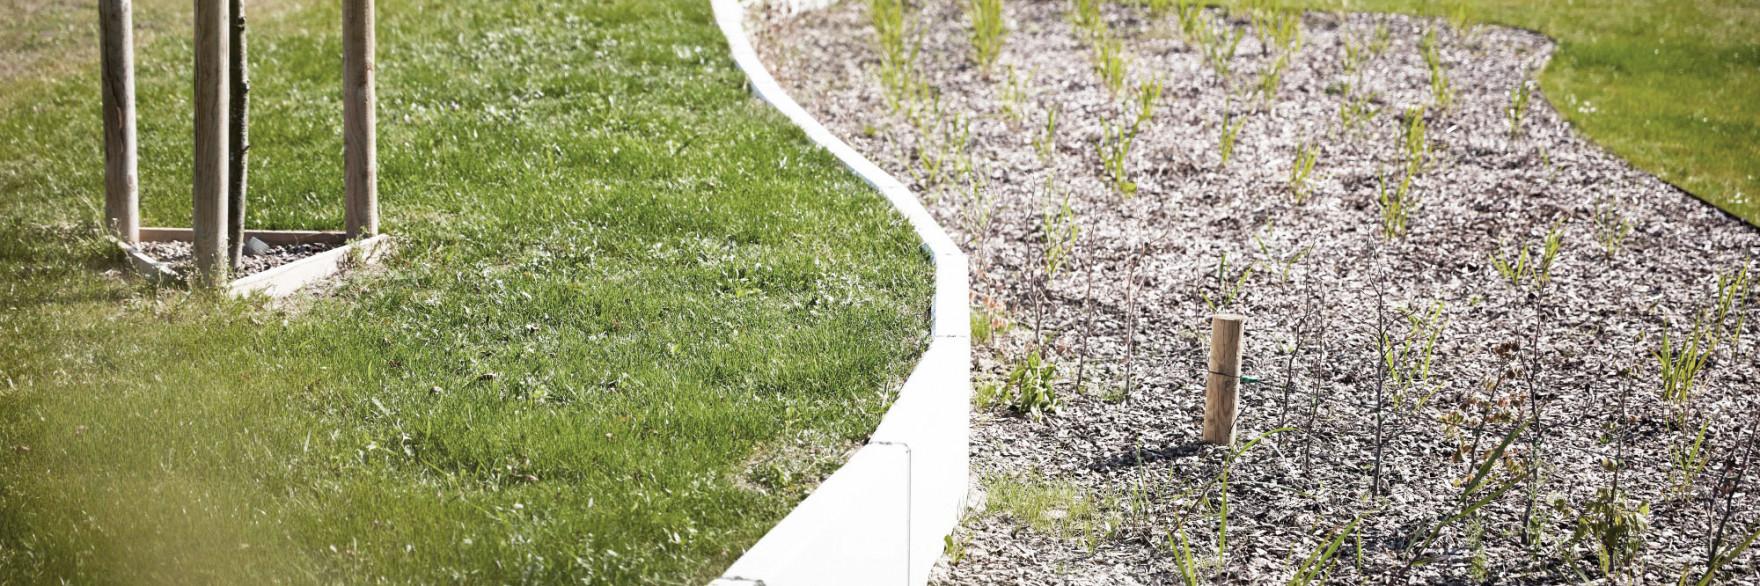 Betonproducten tuinaanleg